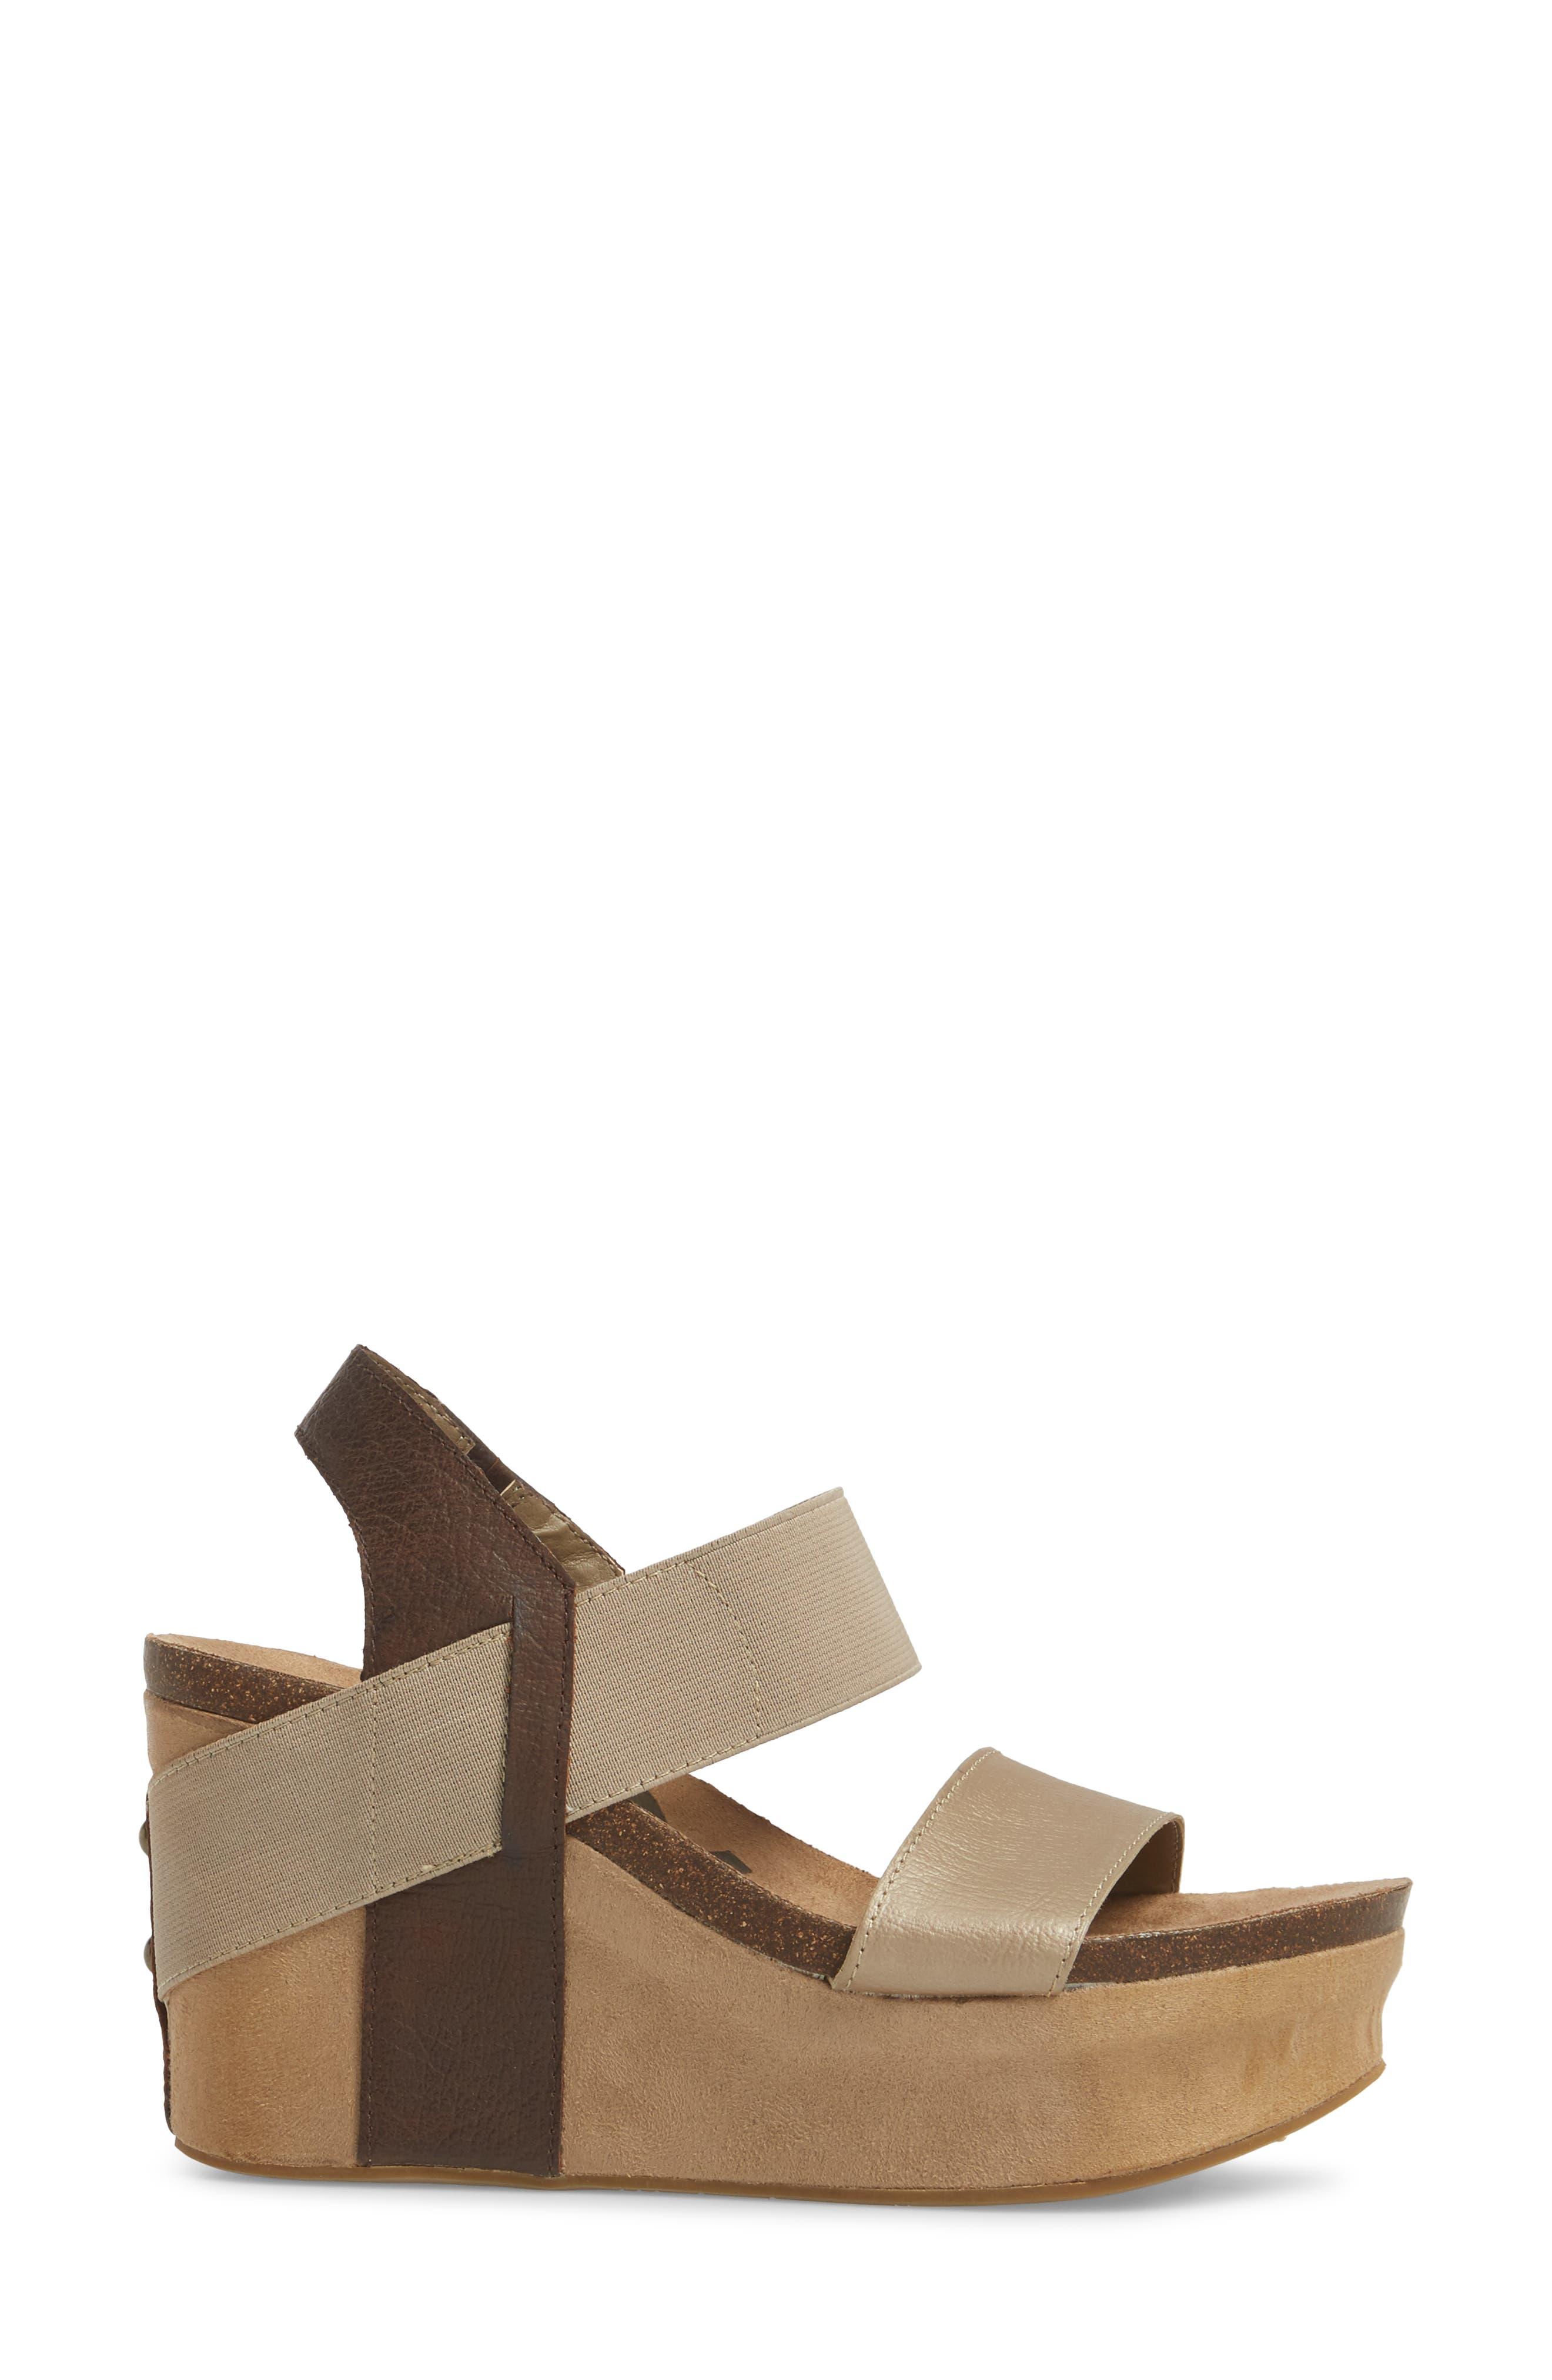 Alternate Image 3  - OTBT 'Bushnell' Wedge Sandal